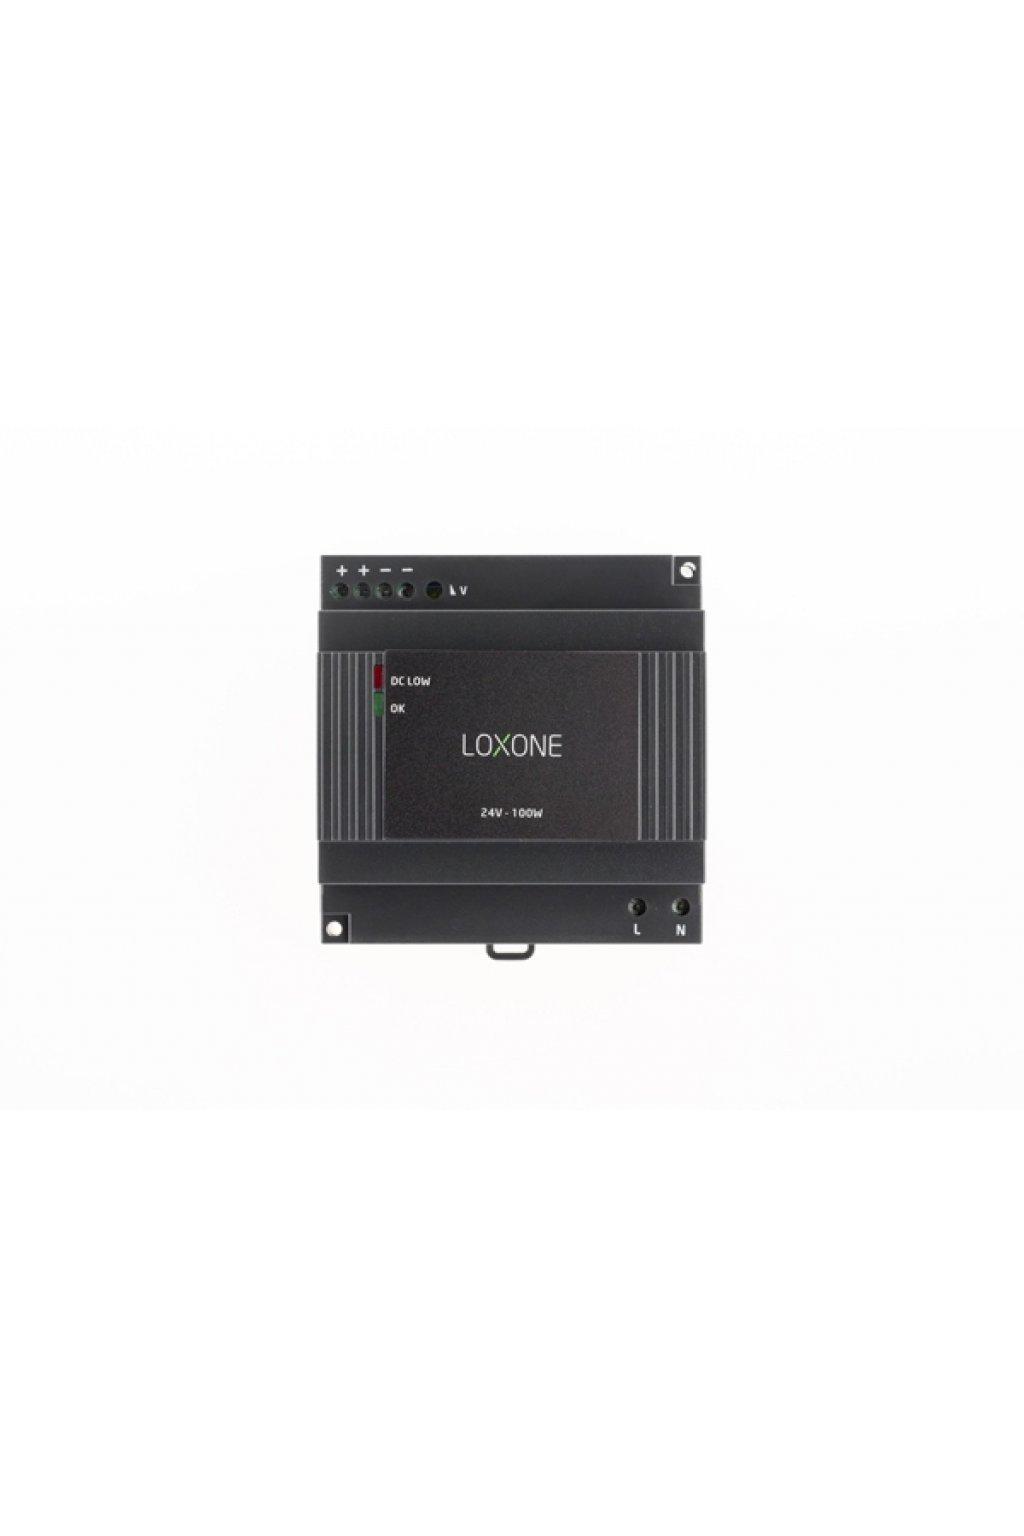 c loxone 24v power supply 100w 01@2x